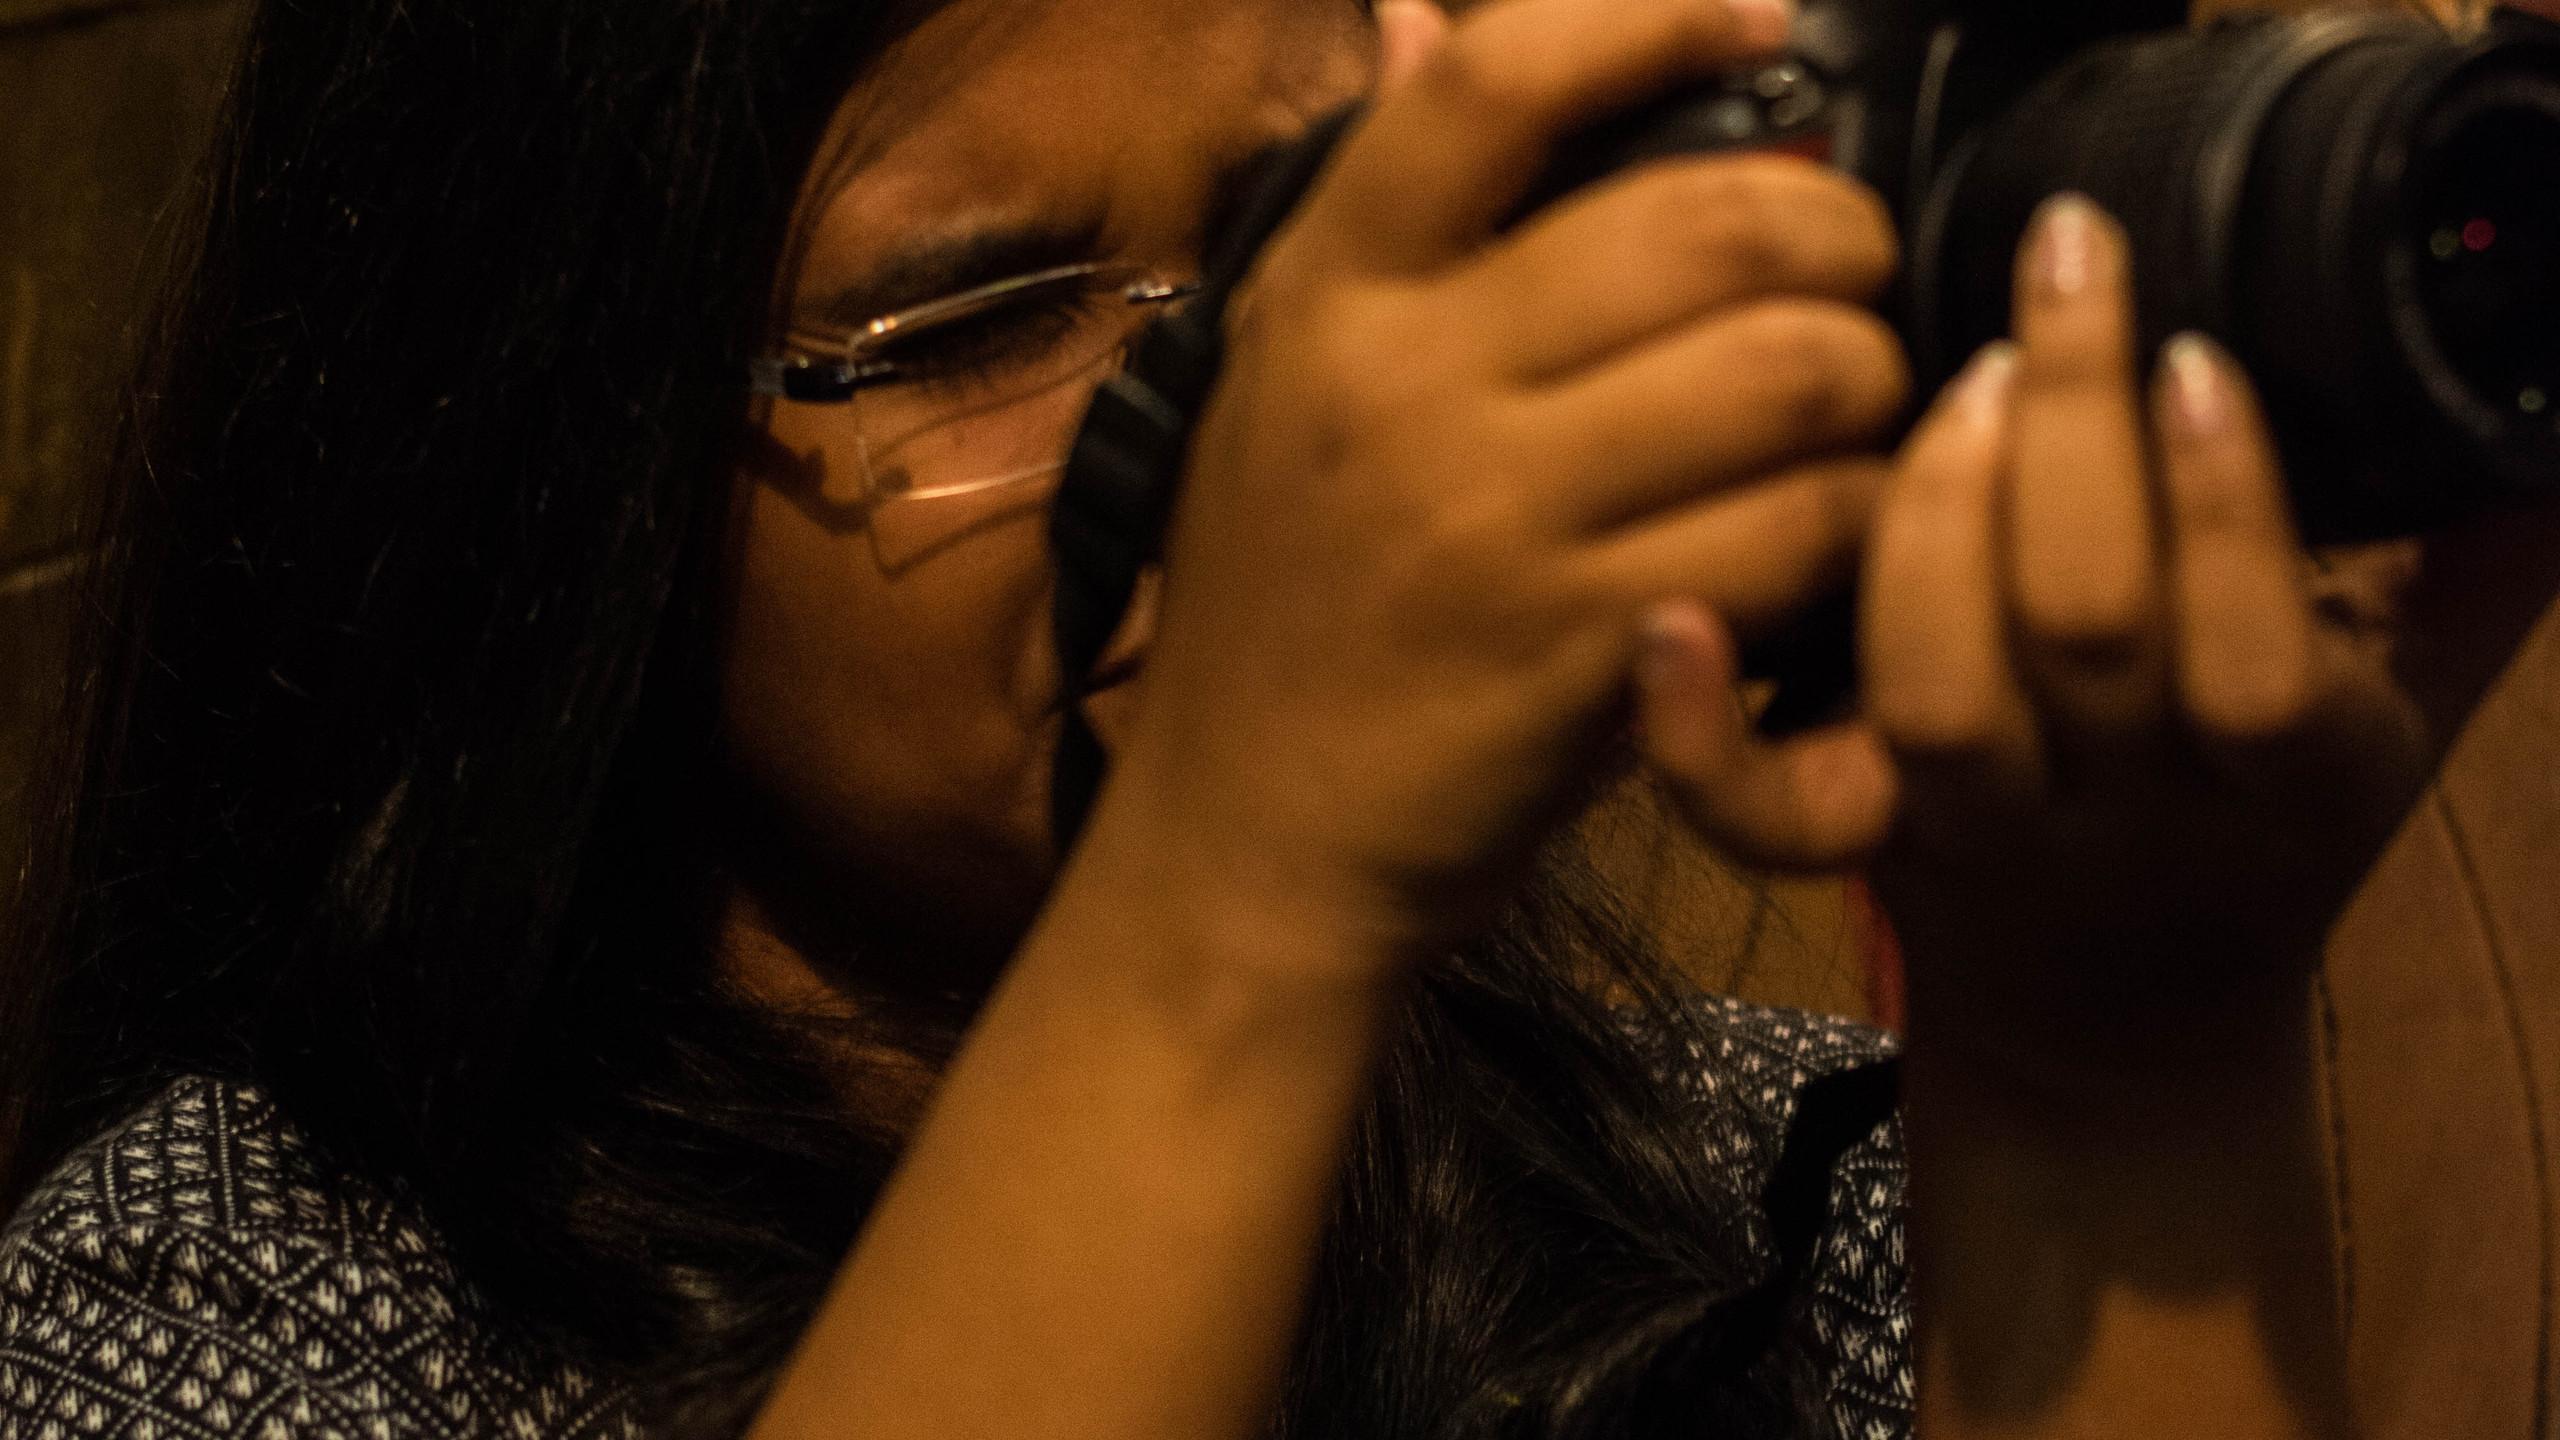 Smita Mulik clicking pics at event